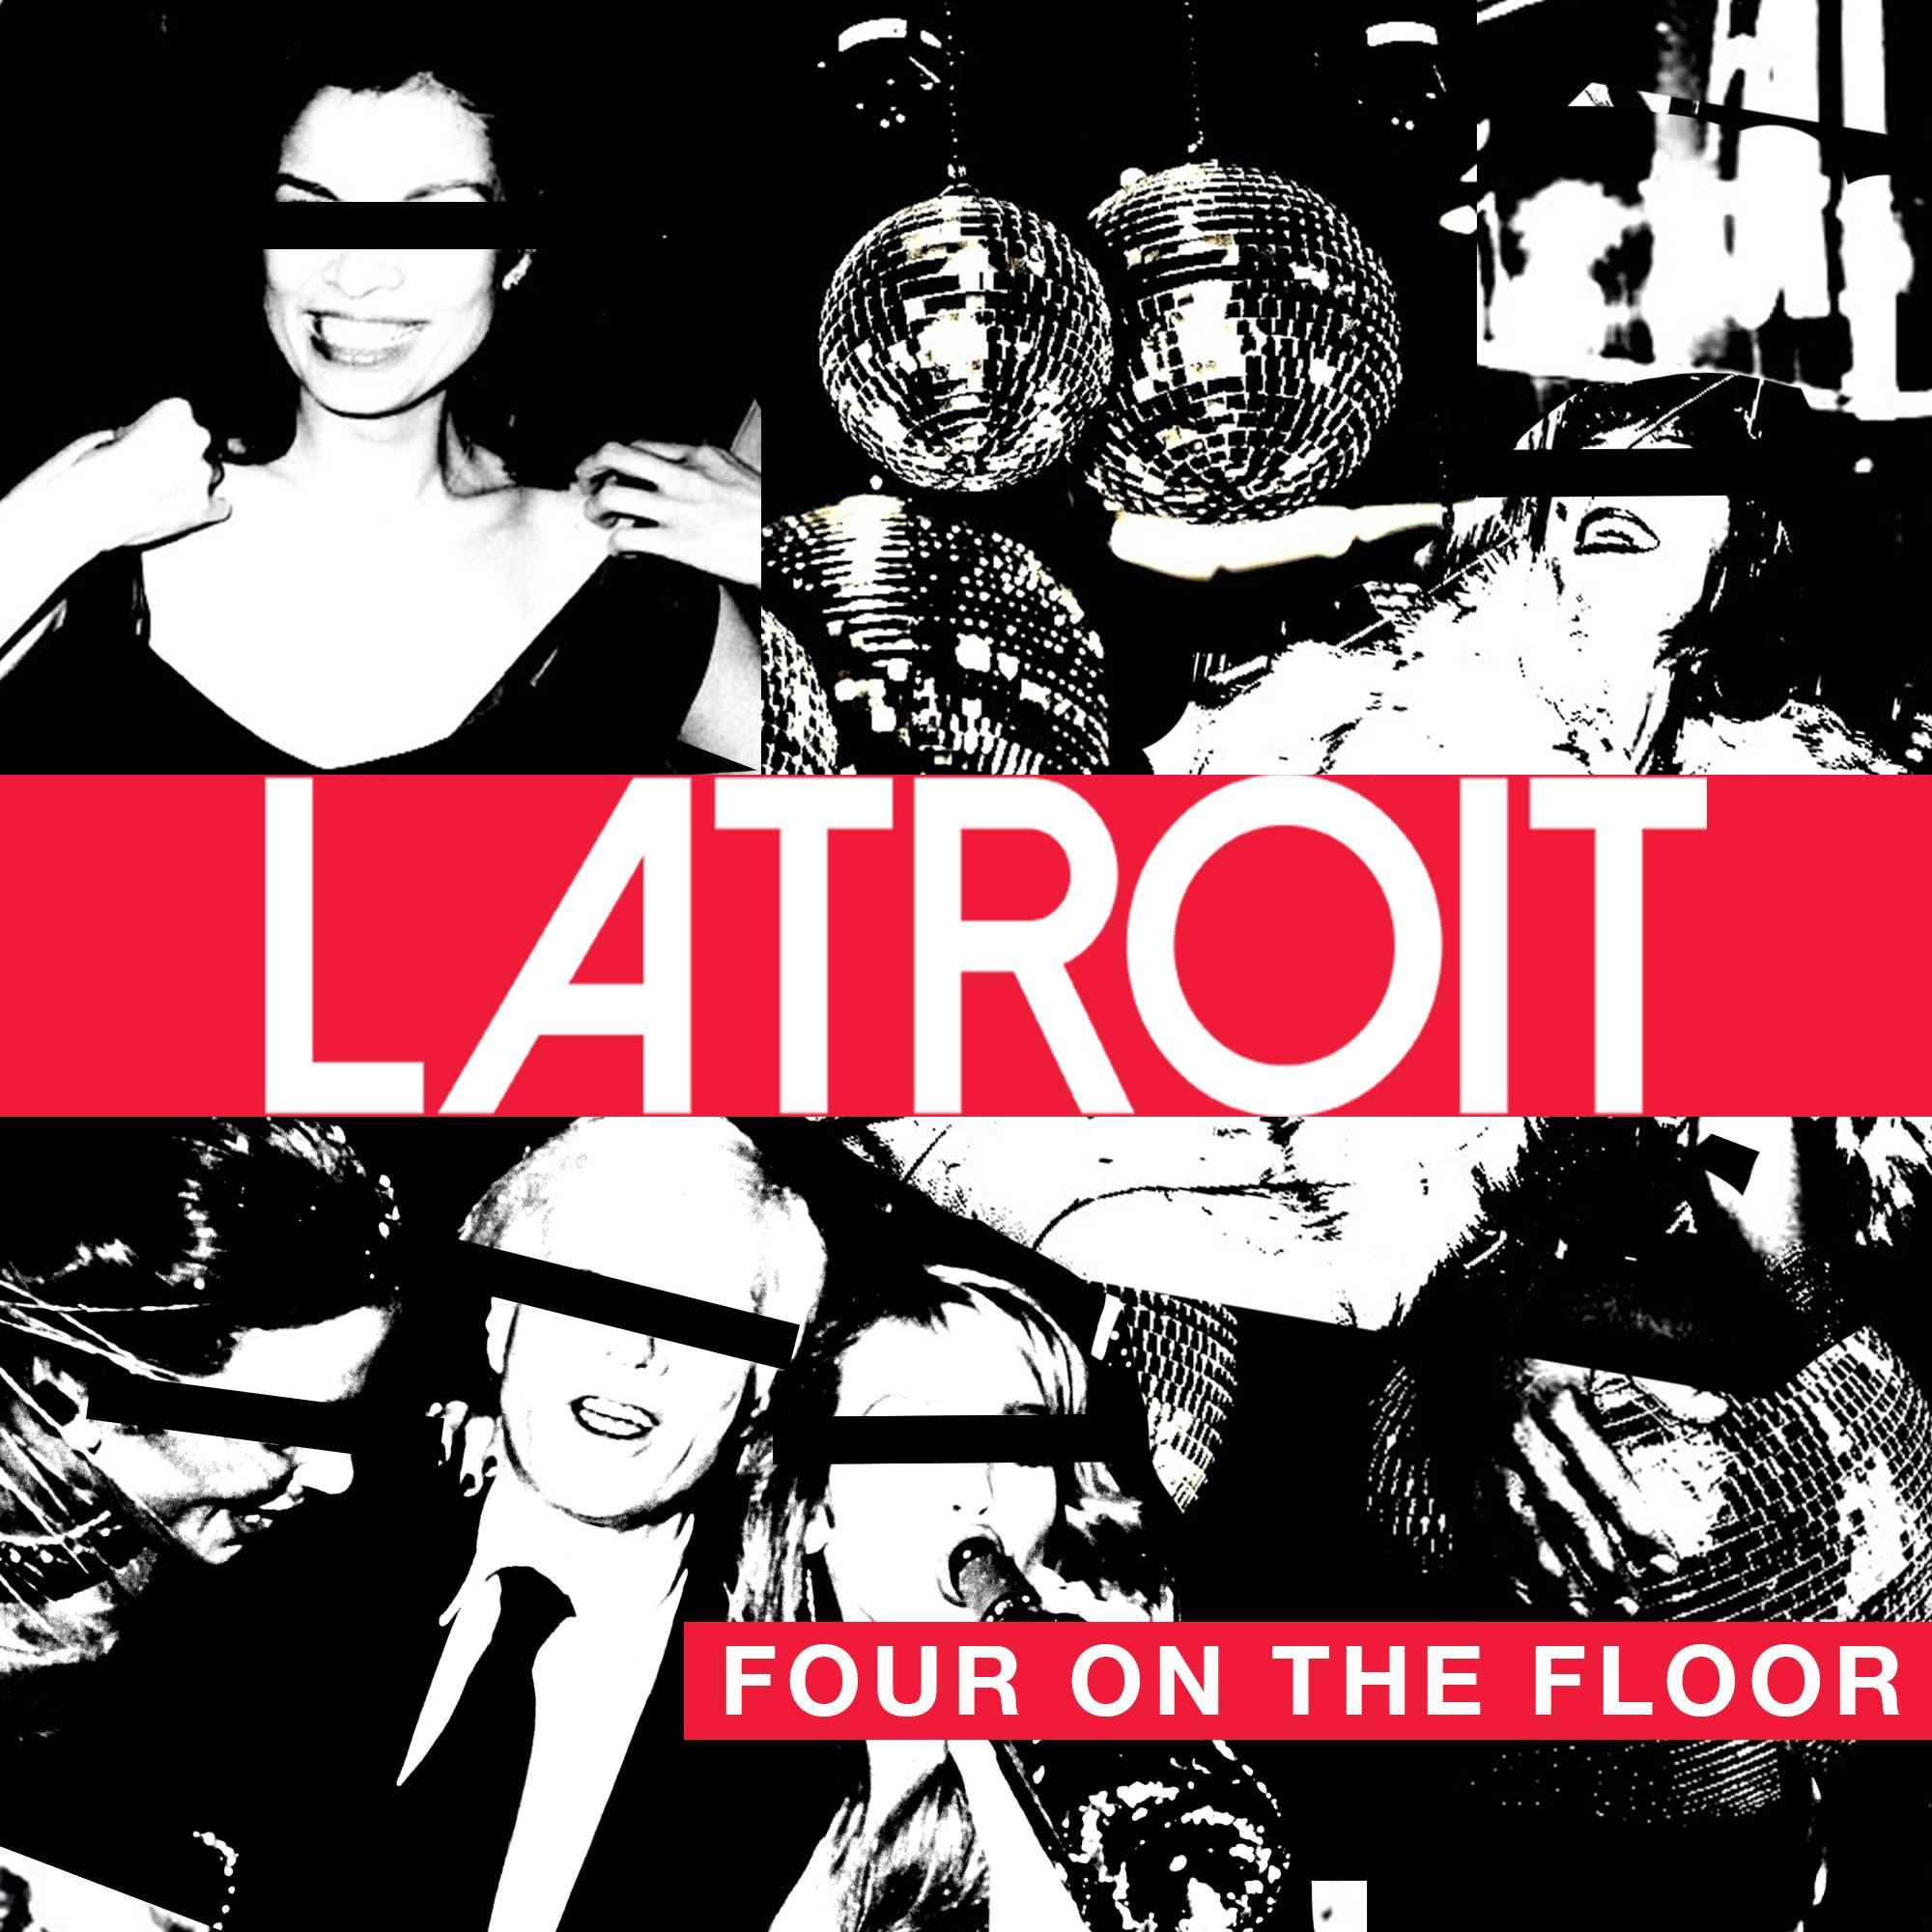 Remix Competition: Latroit - Four on the Floor   metapop